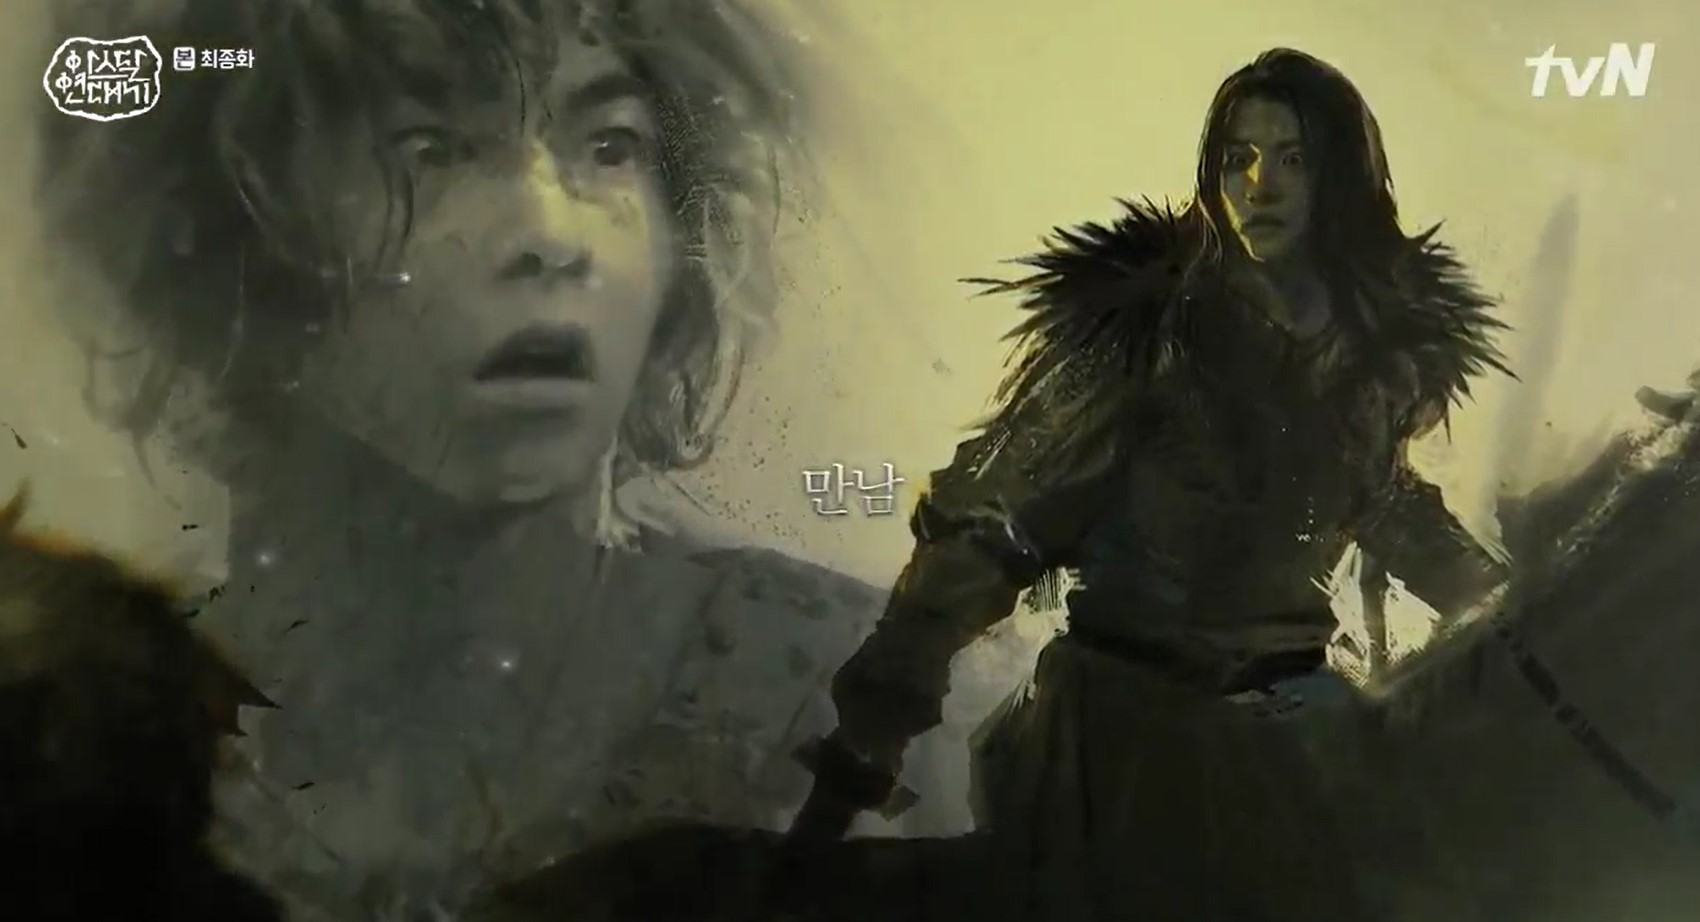 [Spoilers] Arthdal Chronicles Episode 18